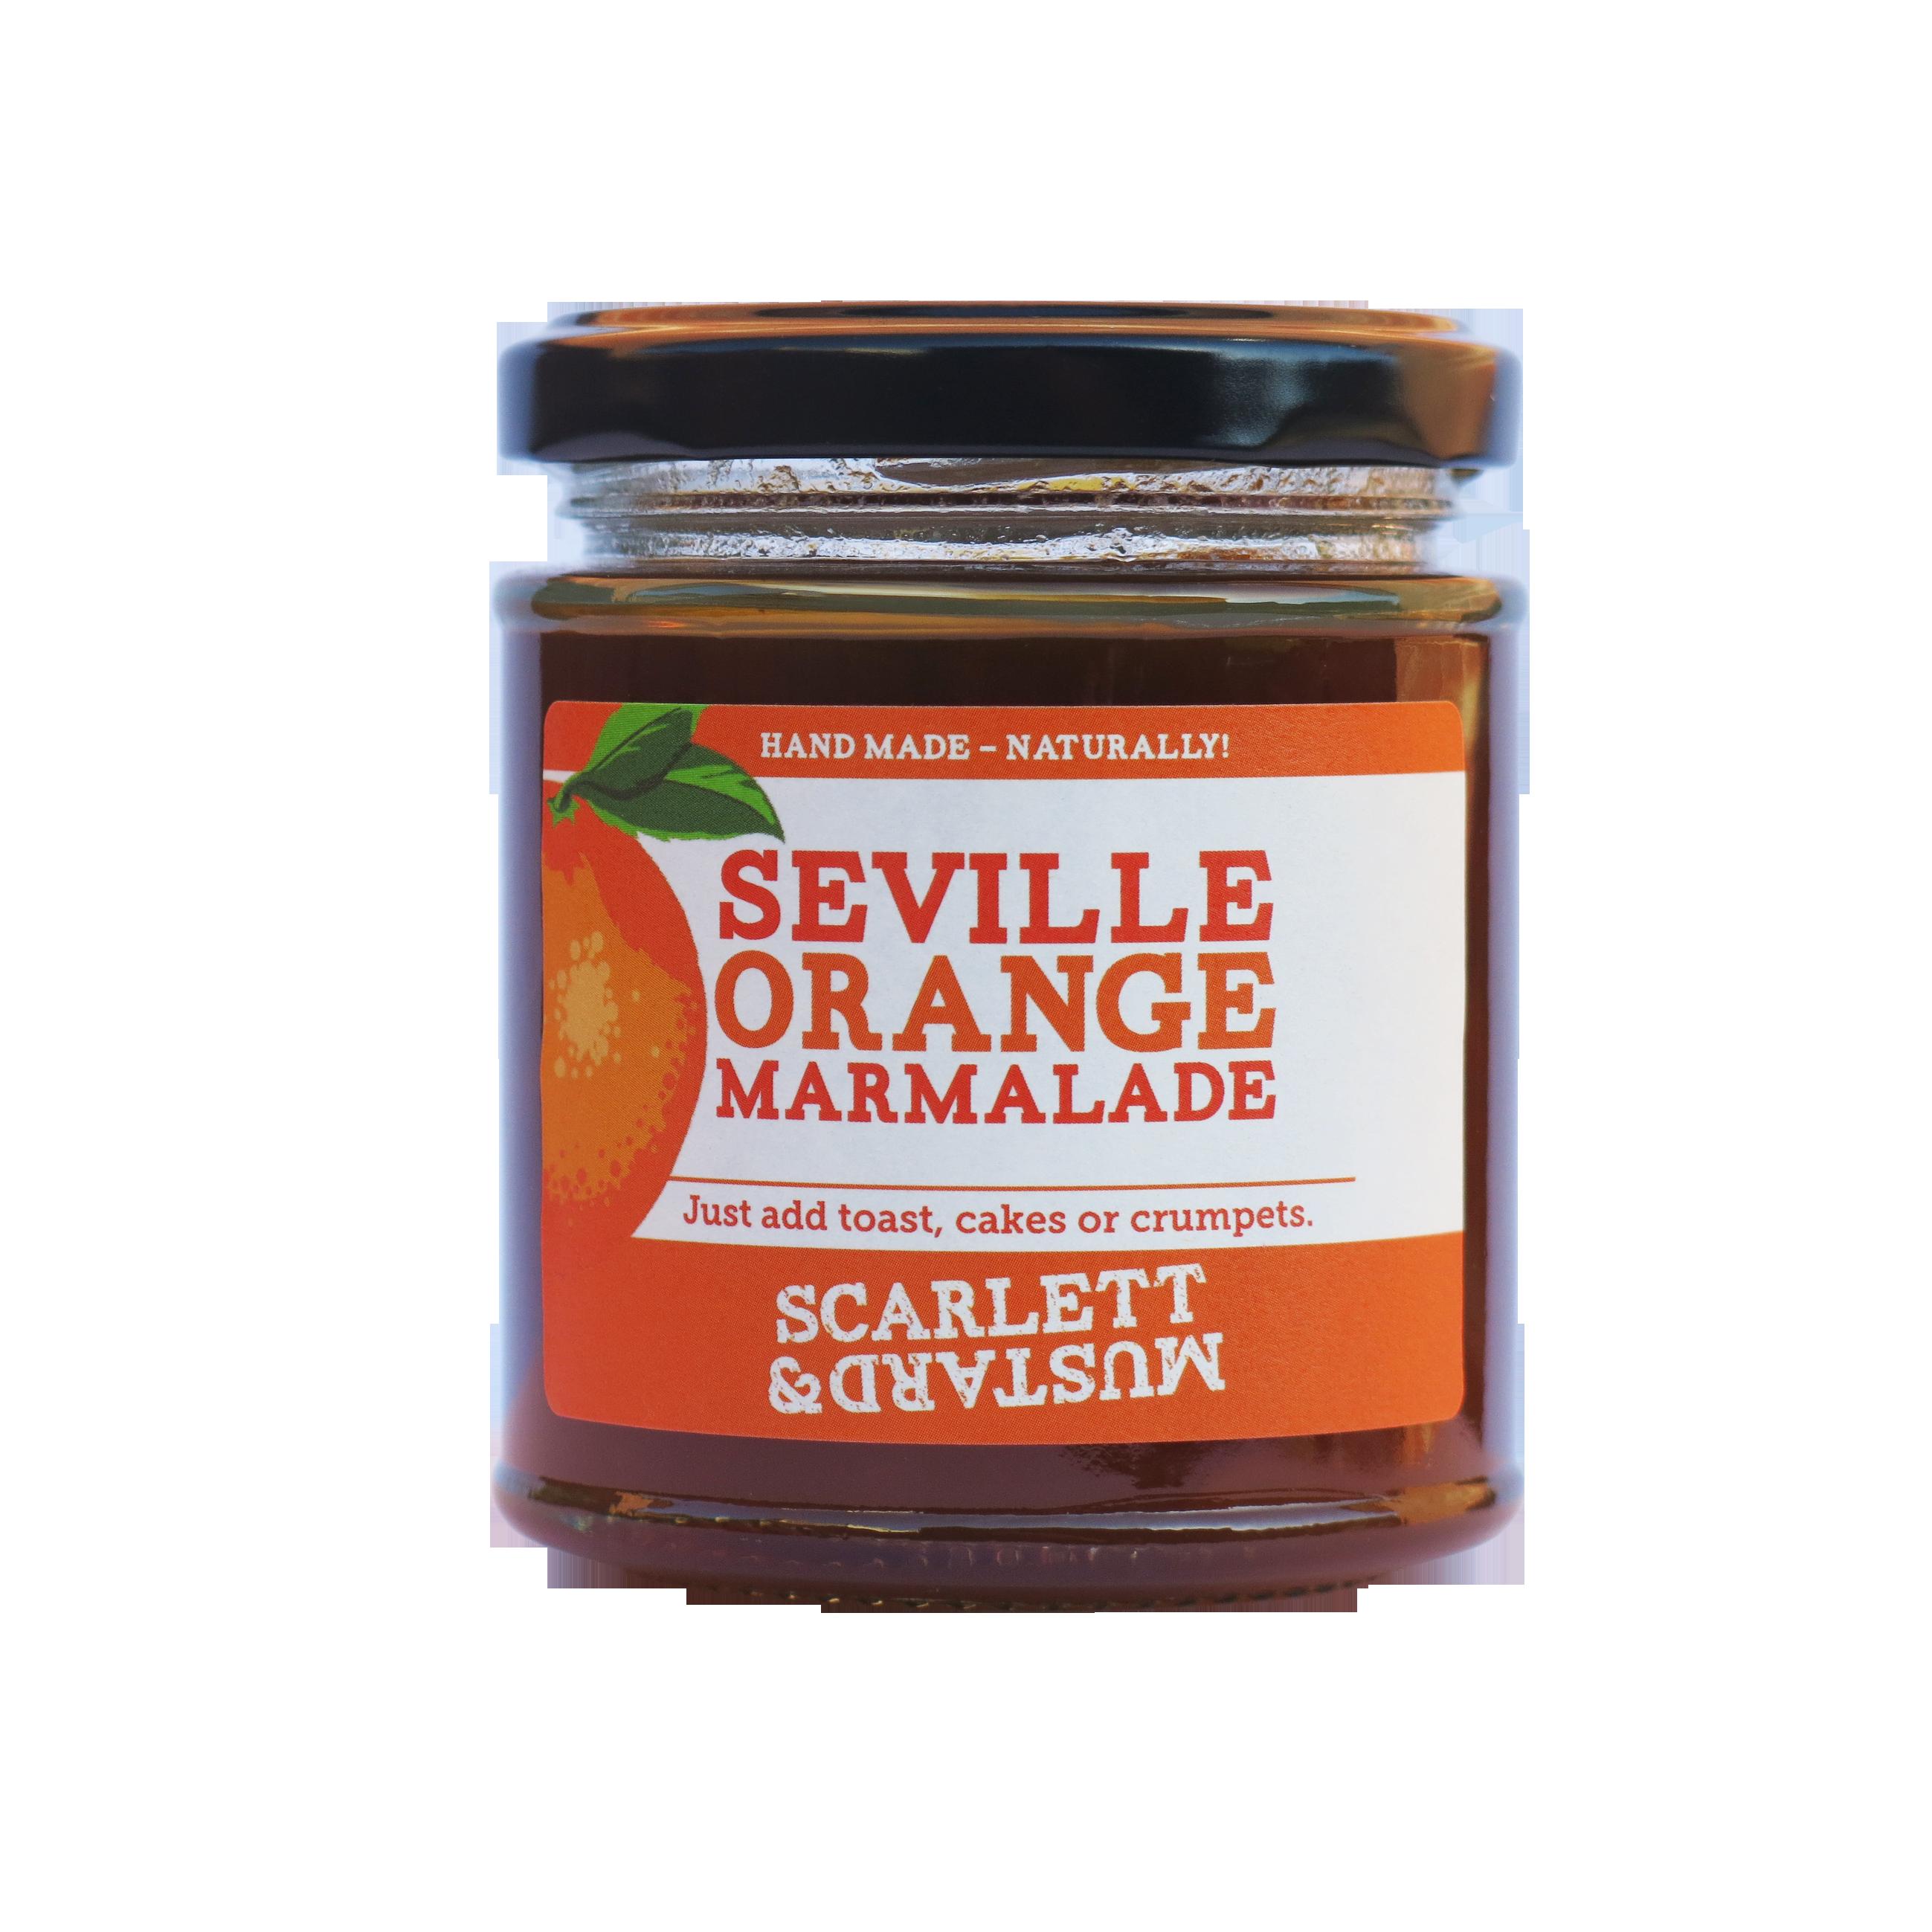 Scarlett & Mustard Seville Orange Marmalade